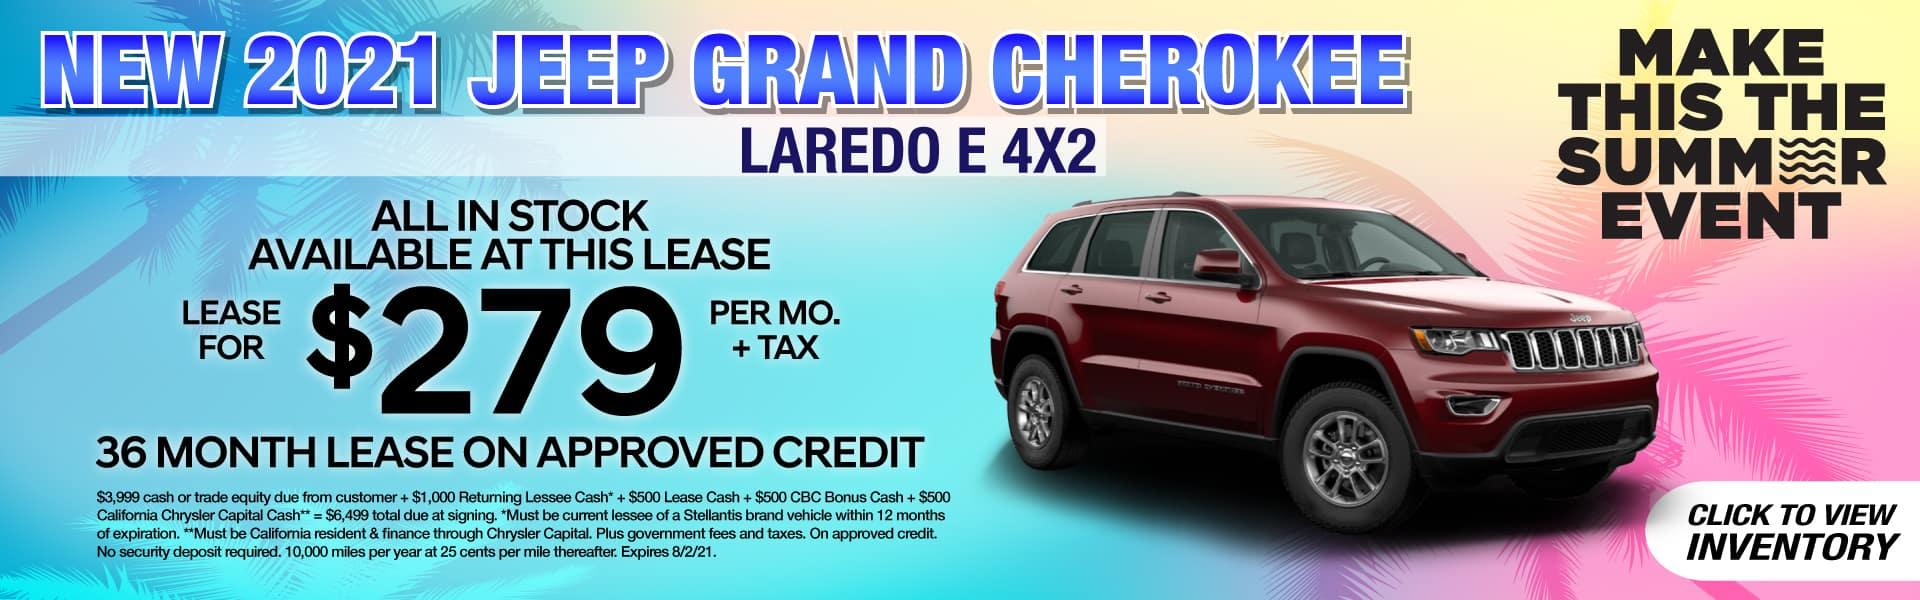 KMSD CDJR 1920px_Lease_Aug2_GC Laredo E